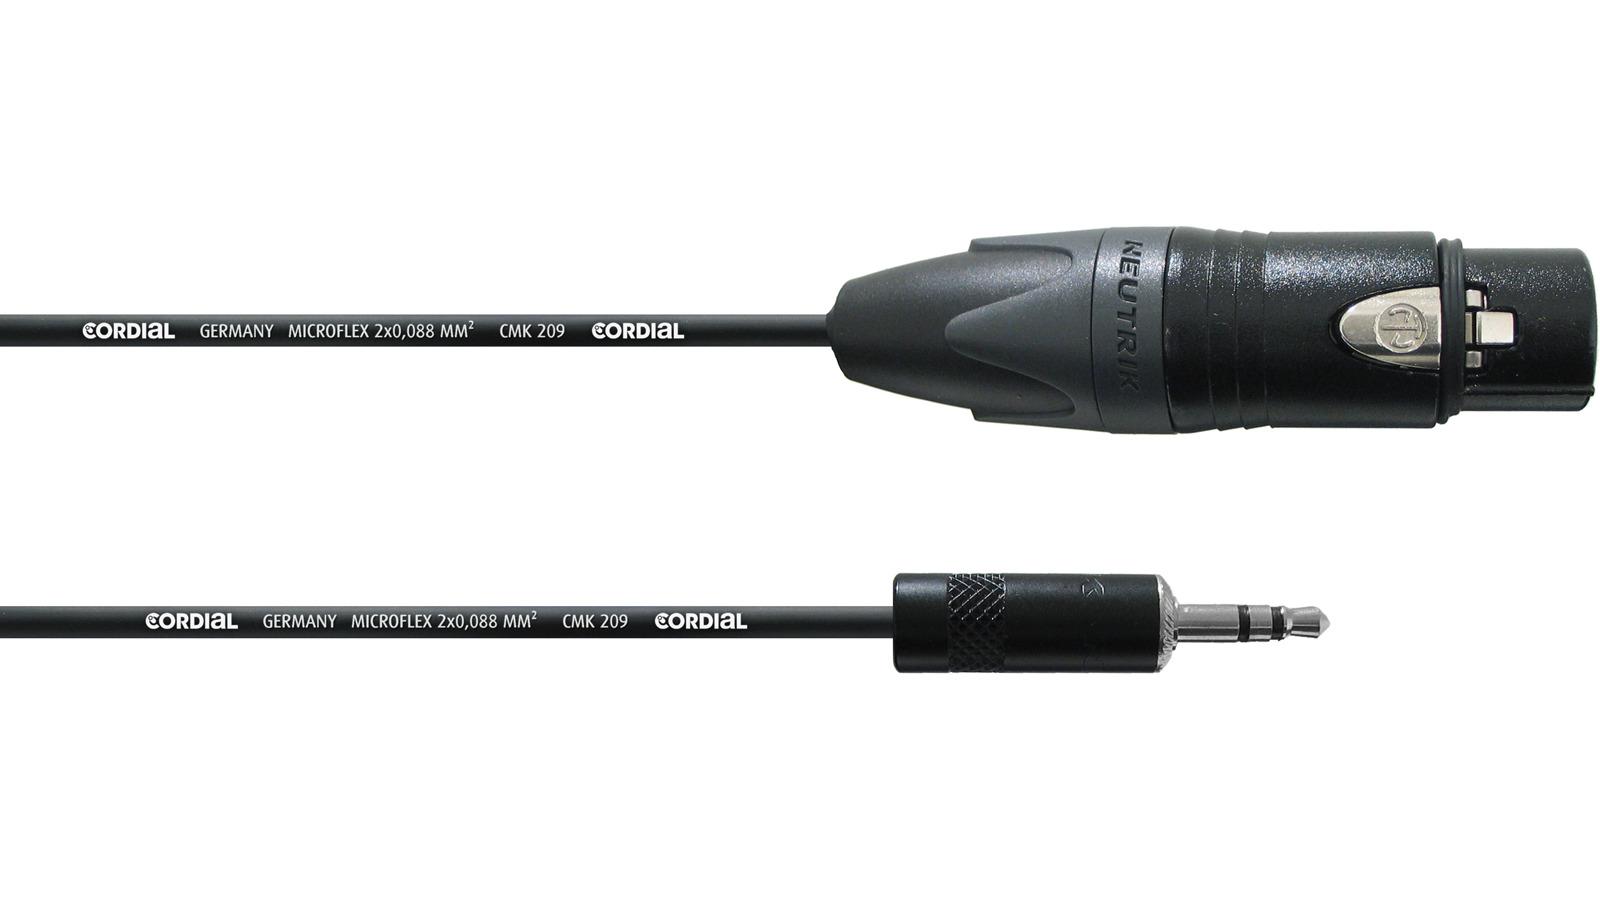 Cordial CPM 3 FW-UNB Mini Klinke XLR Kabel 3 m